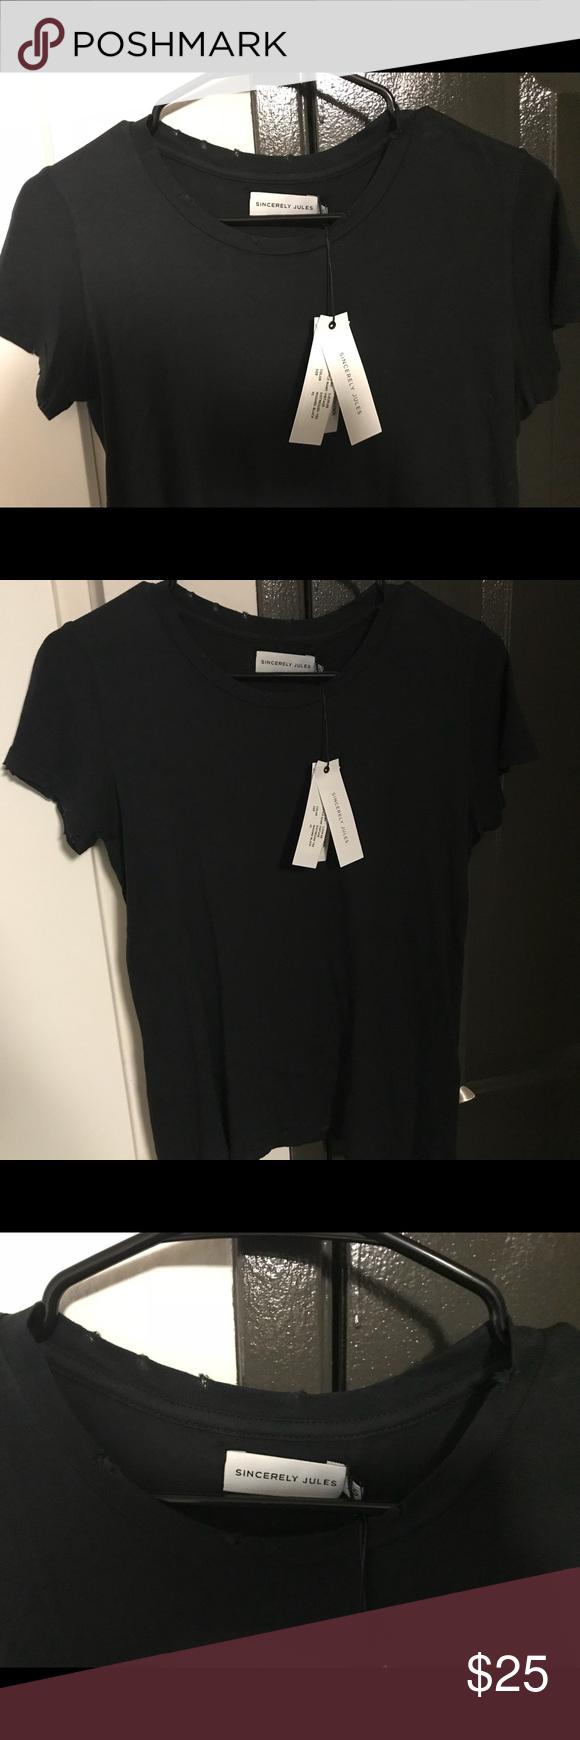 60e033c7 Designer T Shirts Next Day Delivery - DREAMWORKS